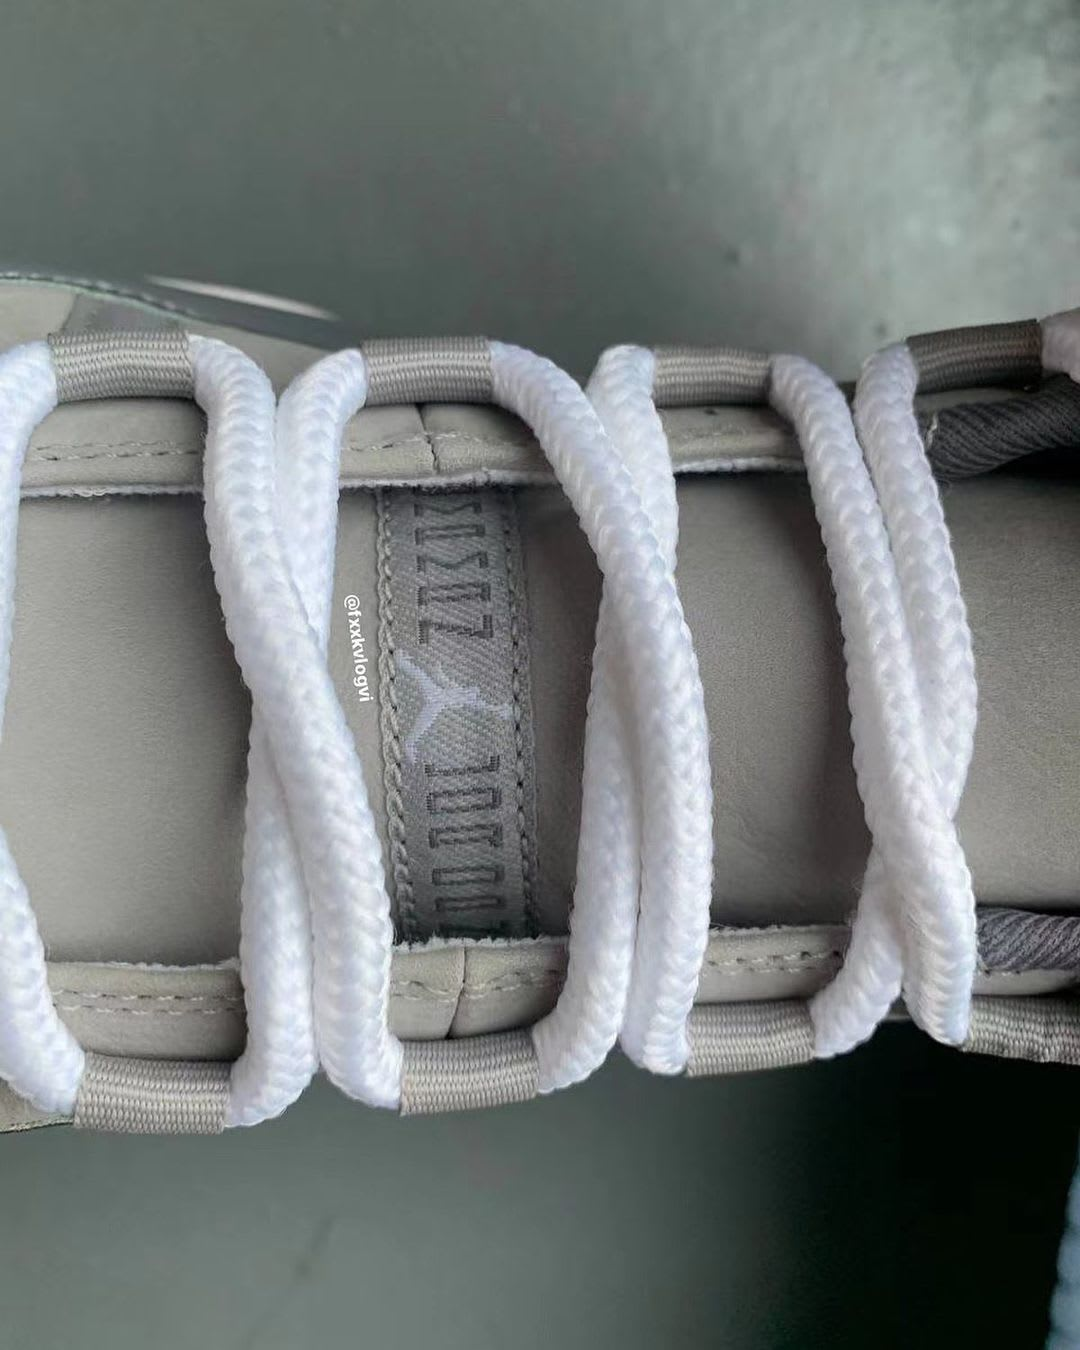 Air Jordan 11 Retro 'Cool Grey' 2021 CT8012-005 Tongue